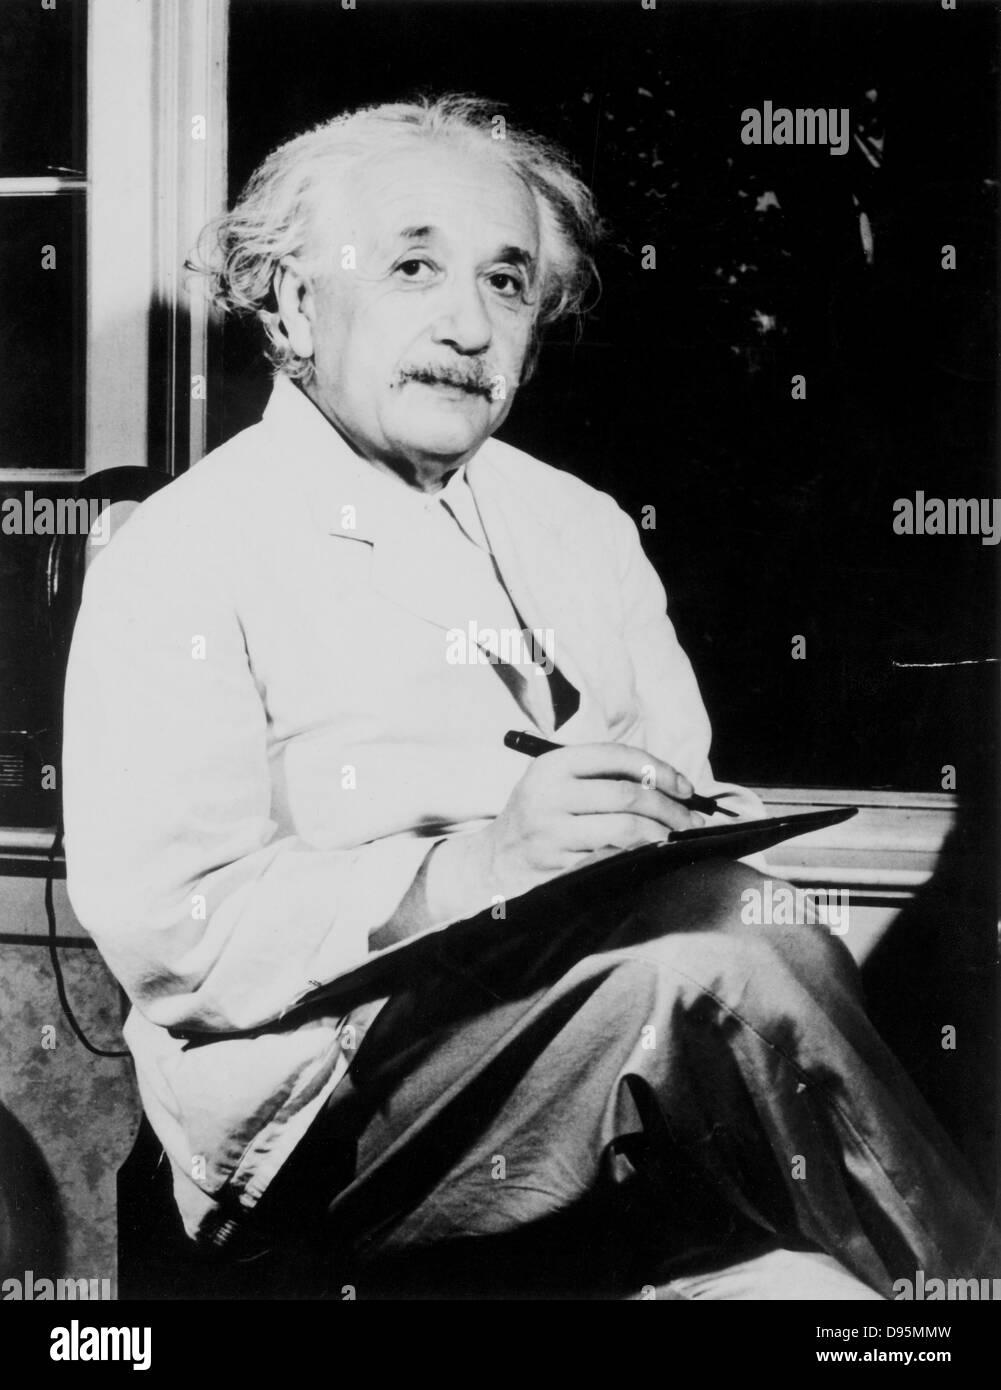 Albert Einstein (1879-1955) German-Swiss-American mathematician and physicist. - Stock Image